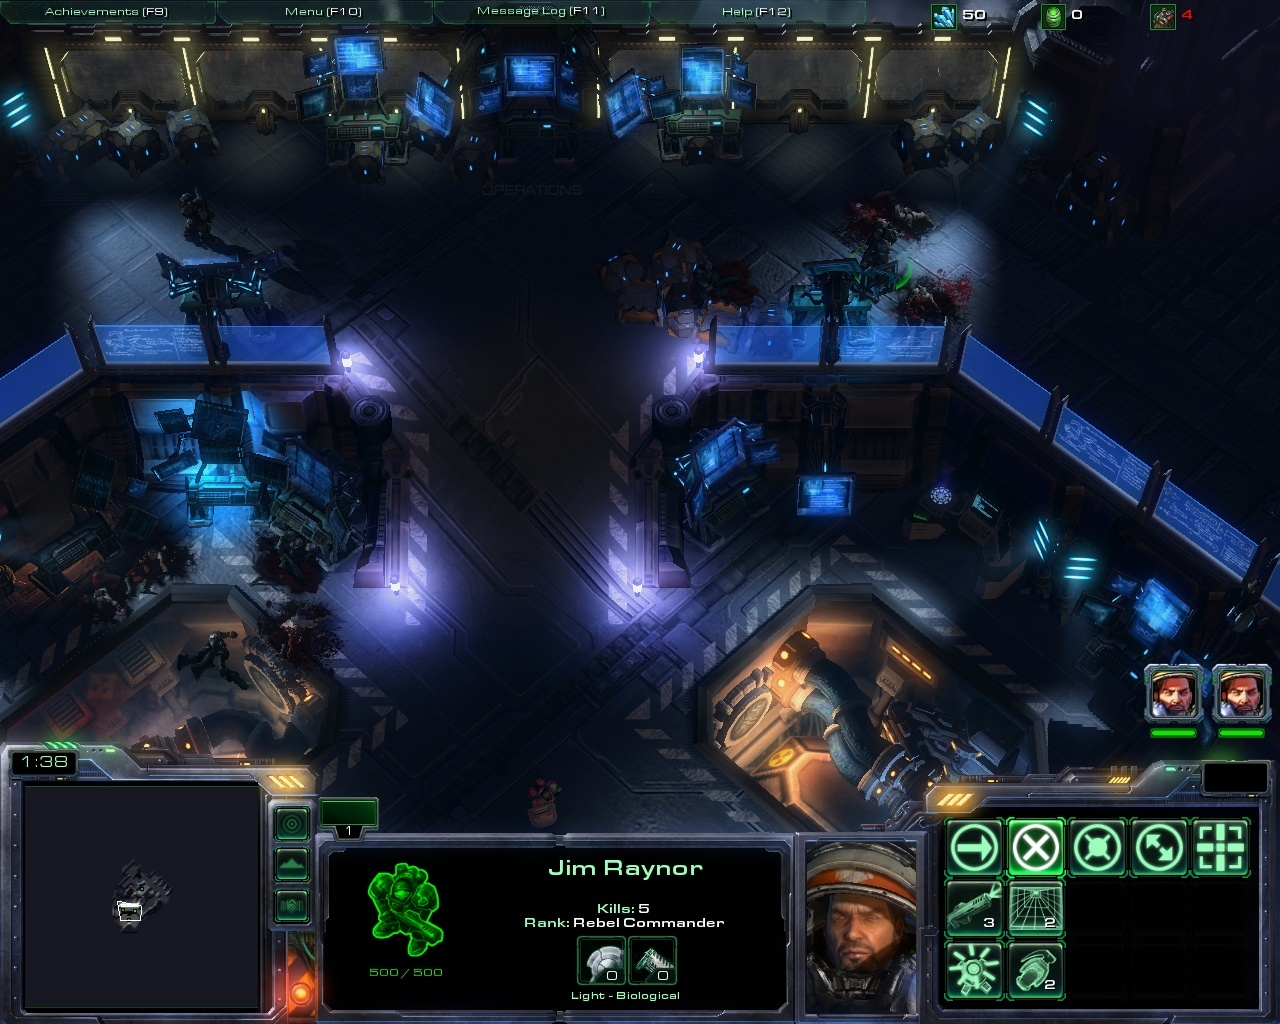 http://xgm.guru/p/sc2/galaxy_editor_landscape